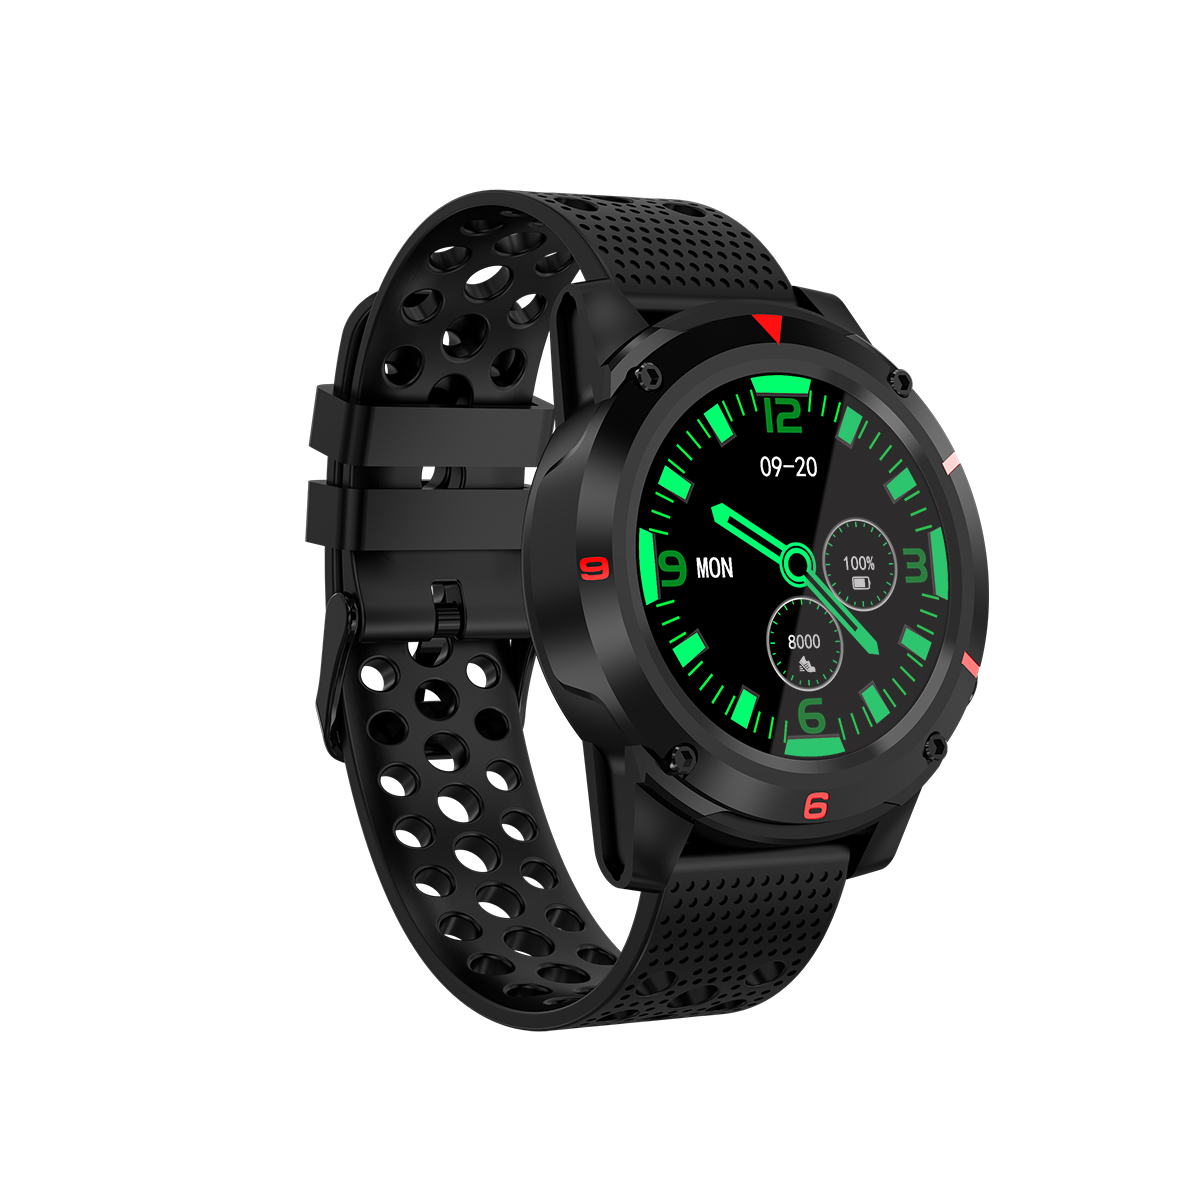 M26 1 3 bluetooth Call Smart Watch Phone Waterproof Heart Rate GPS GLONASS Compass Altimeter Activity